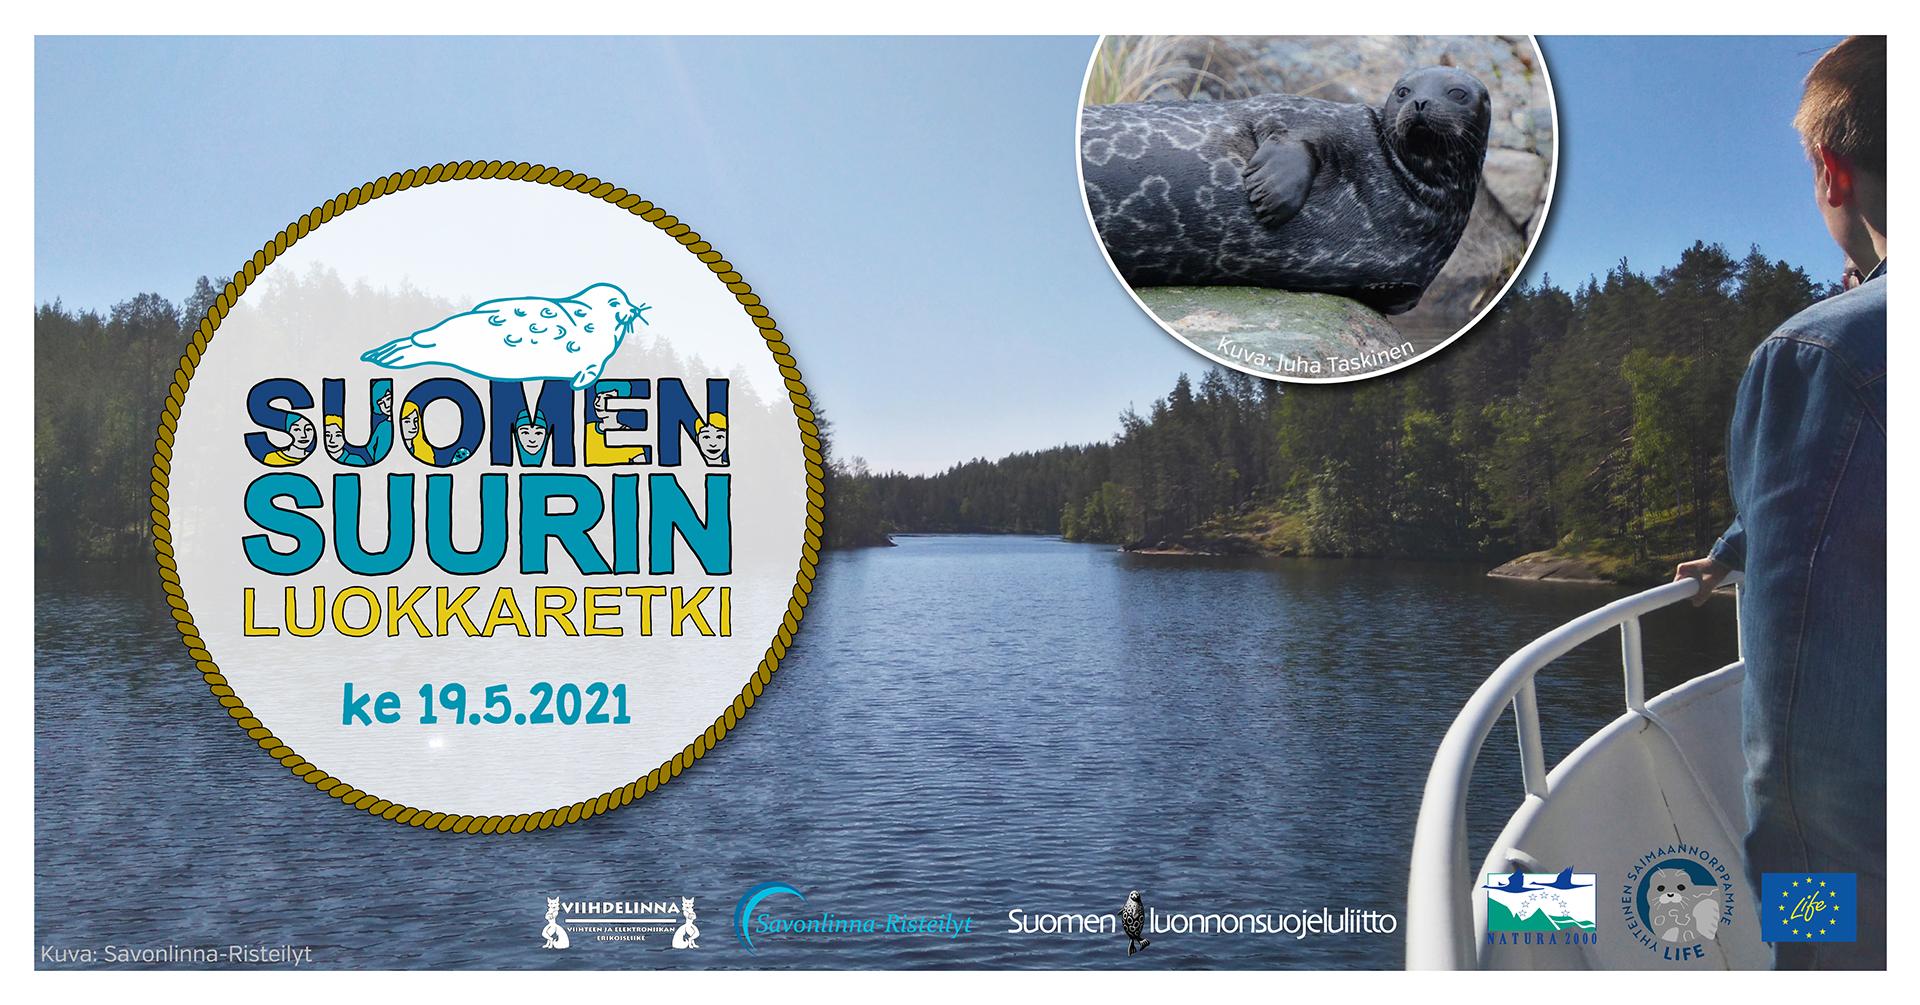 Suomen suurin luokkaretki